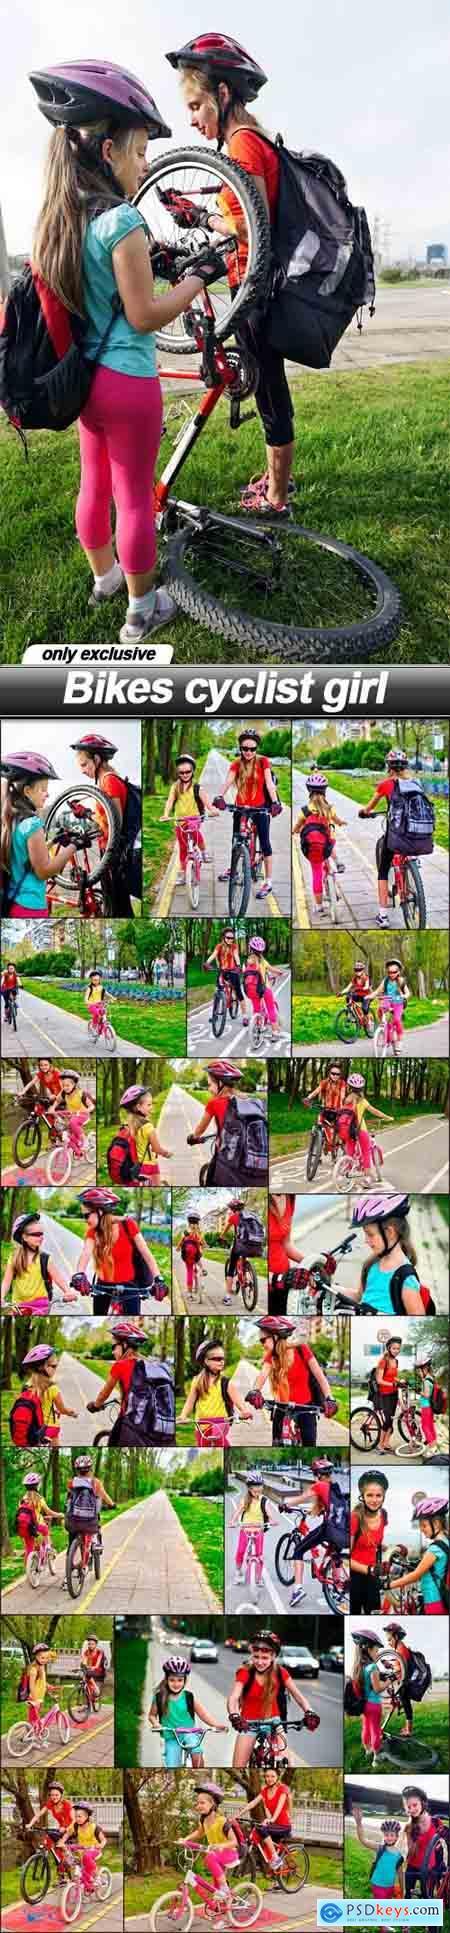 Bikes cyclist girl - 24 UHQ JPEG